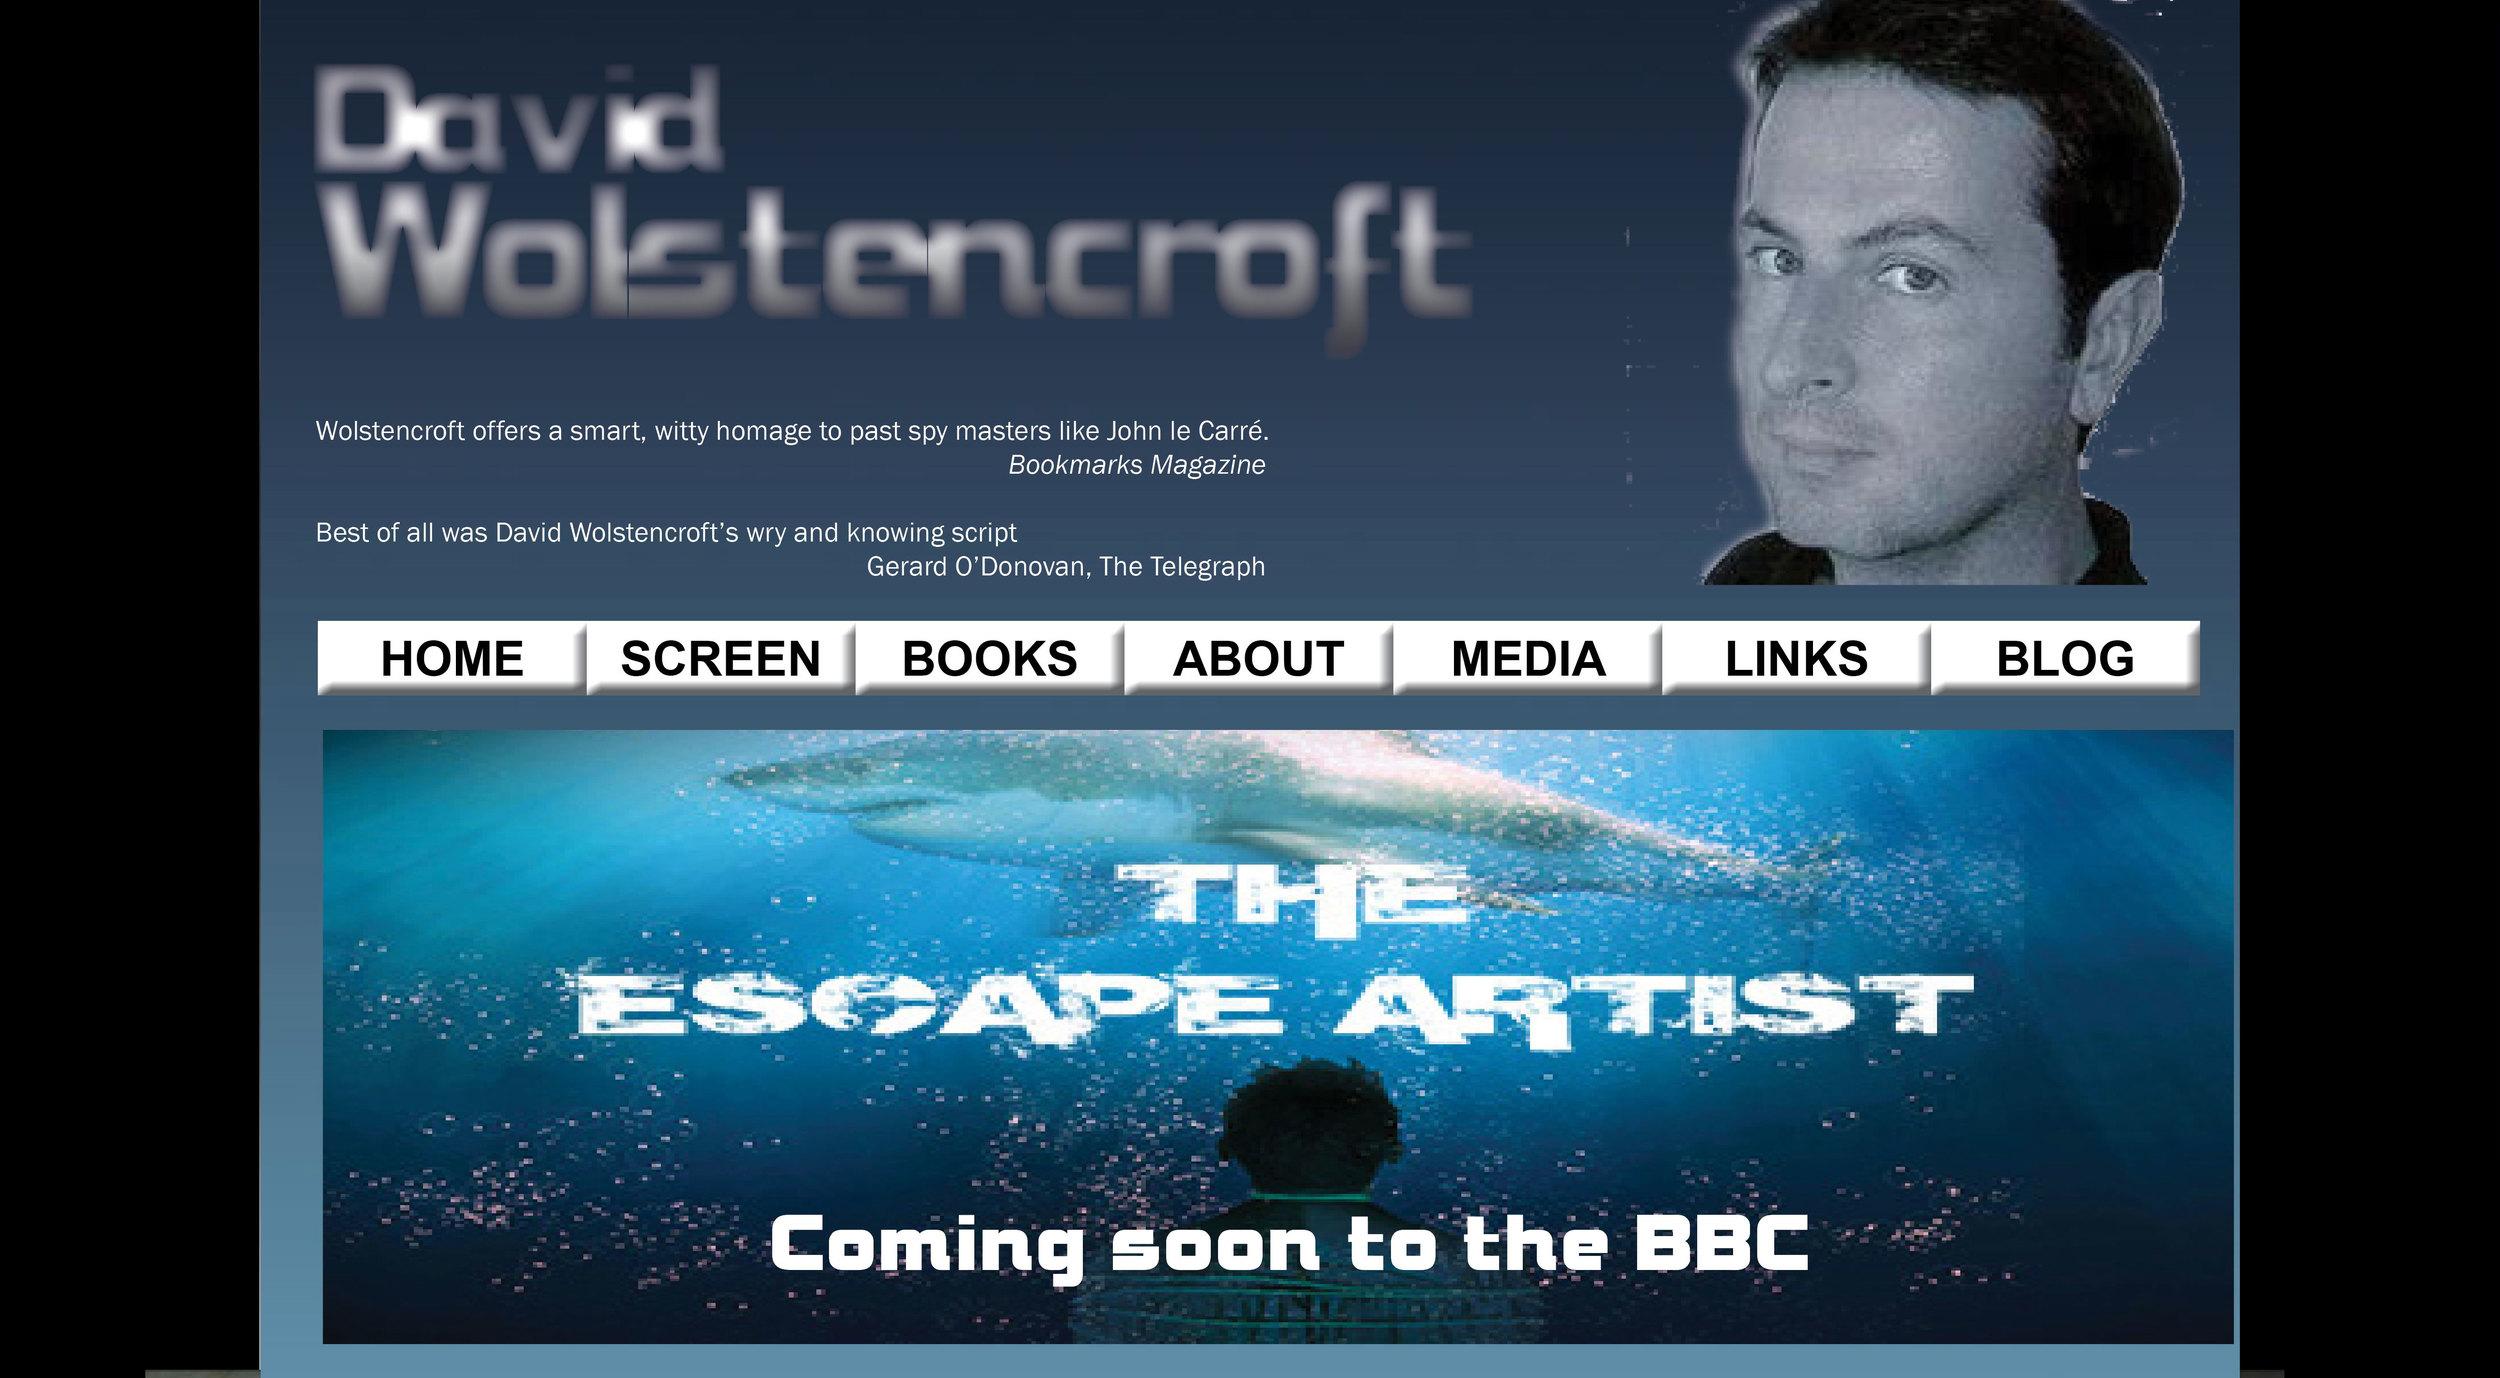 David Wolstencroft WordPress site